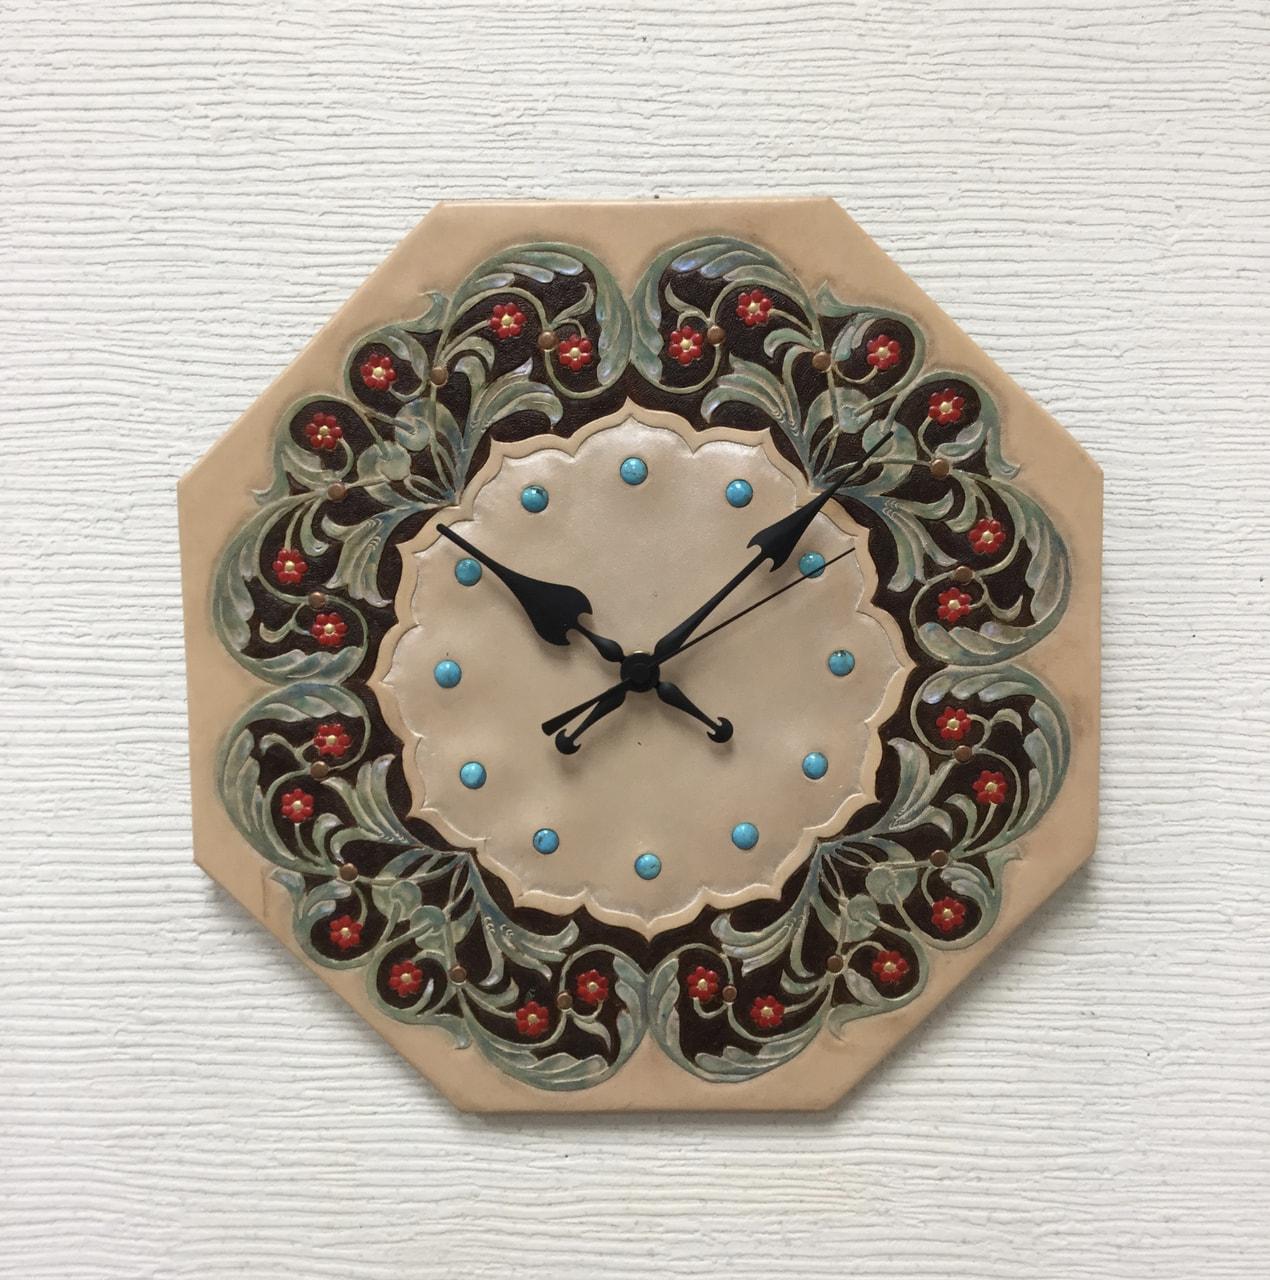 Kさんの時計